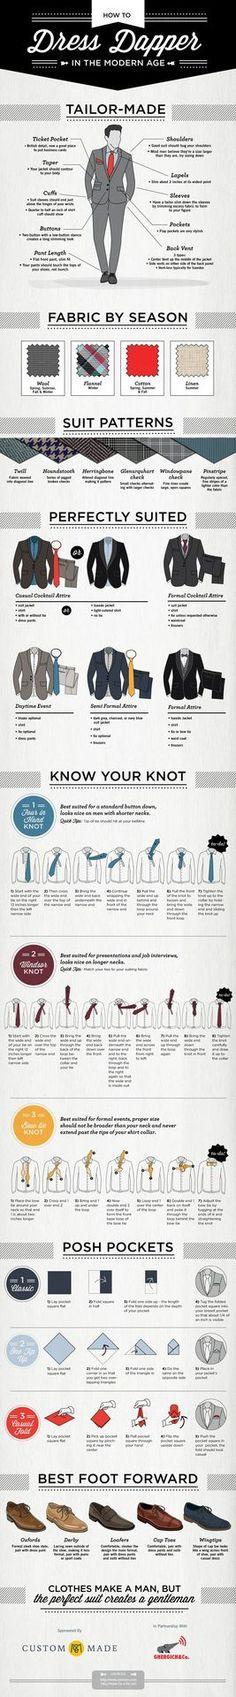 Men's Fashion guide !!